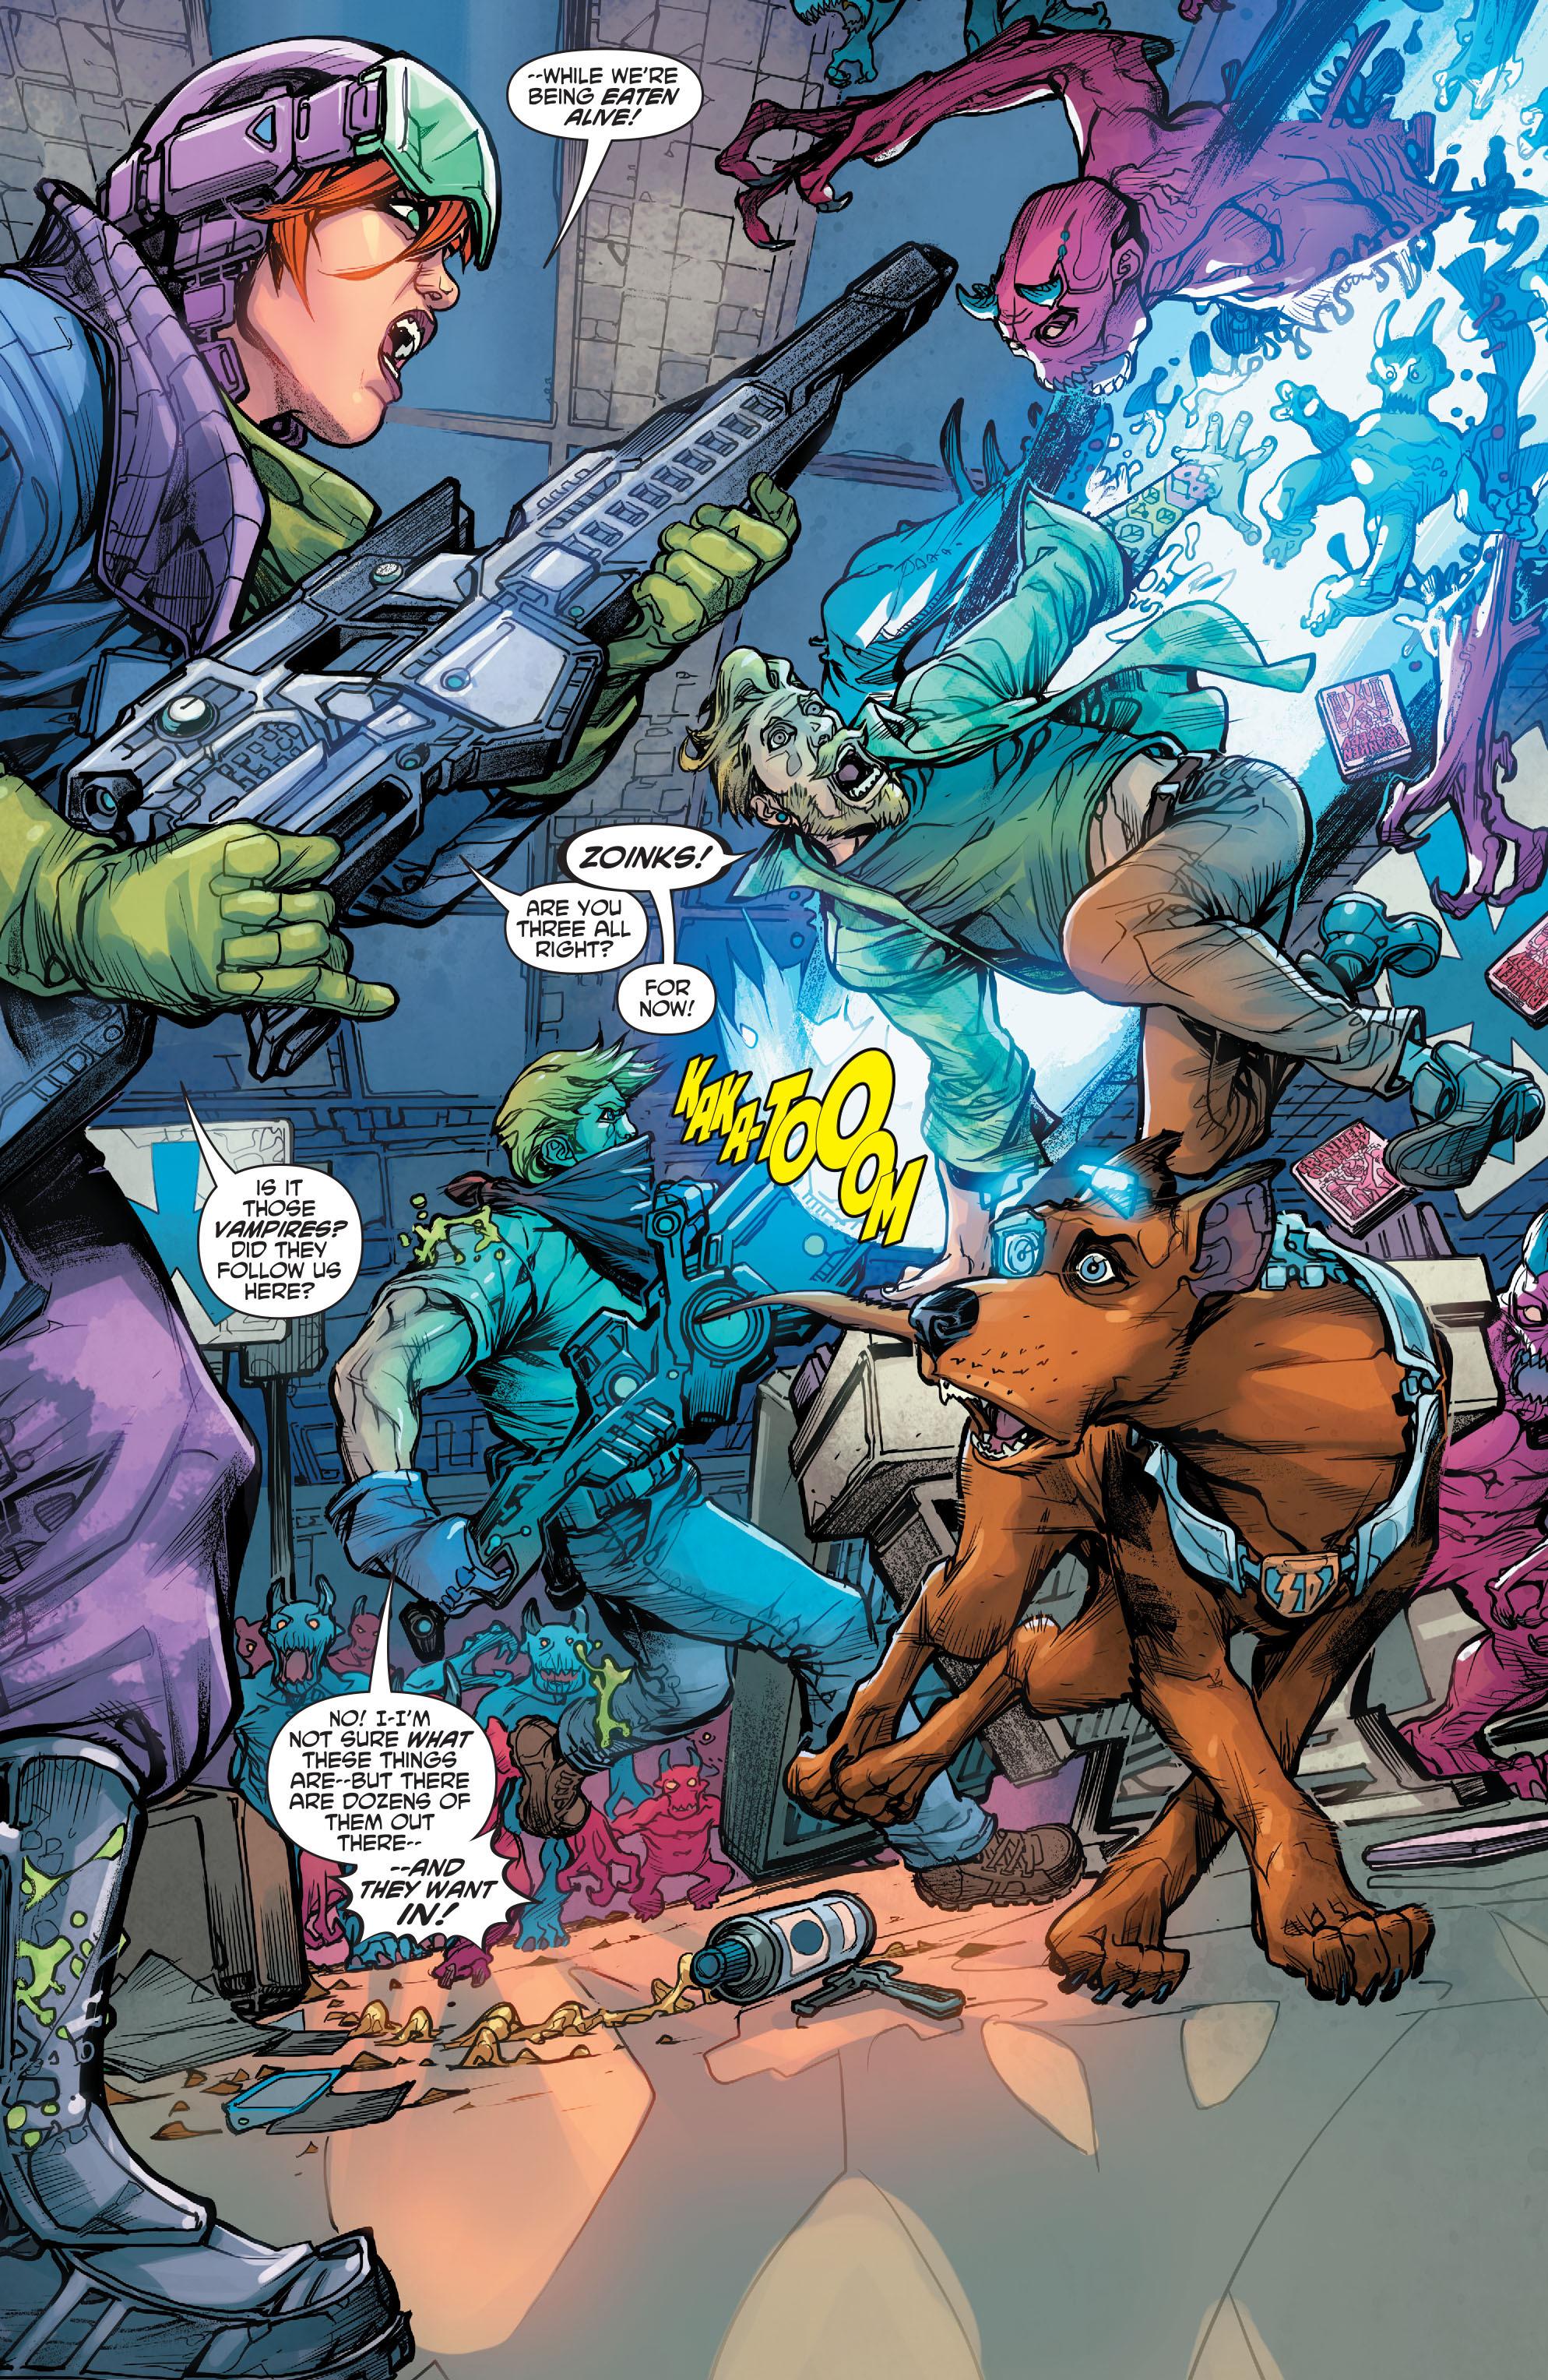 Read online Scooby Apocalypse comic -  Issue #5 - 6